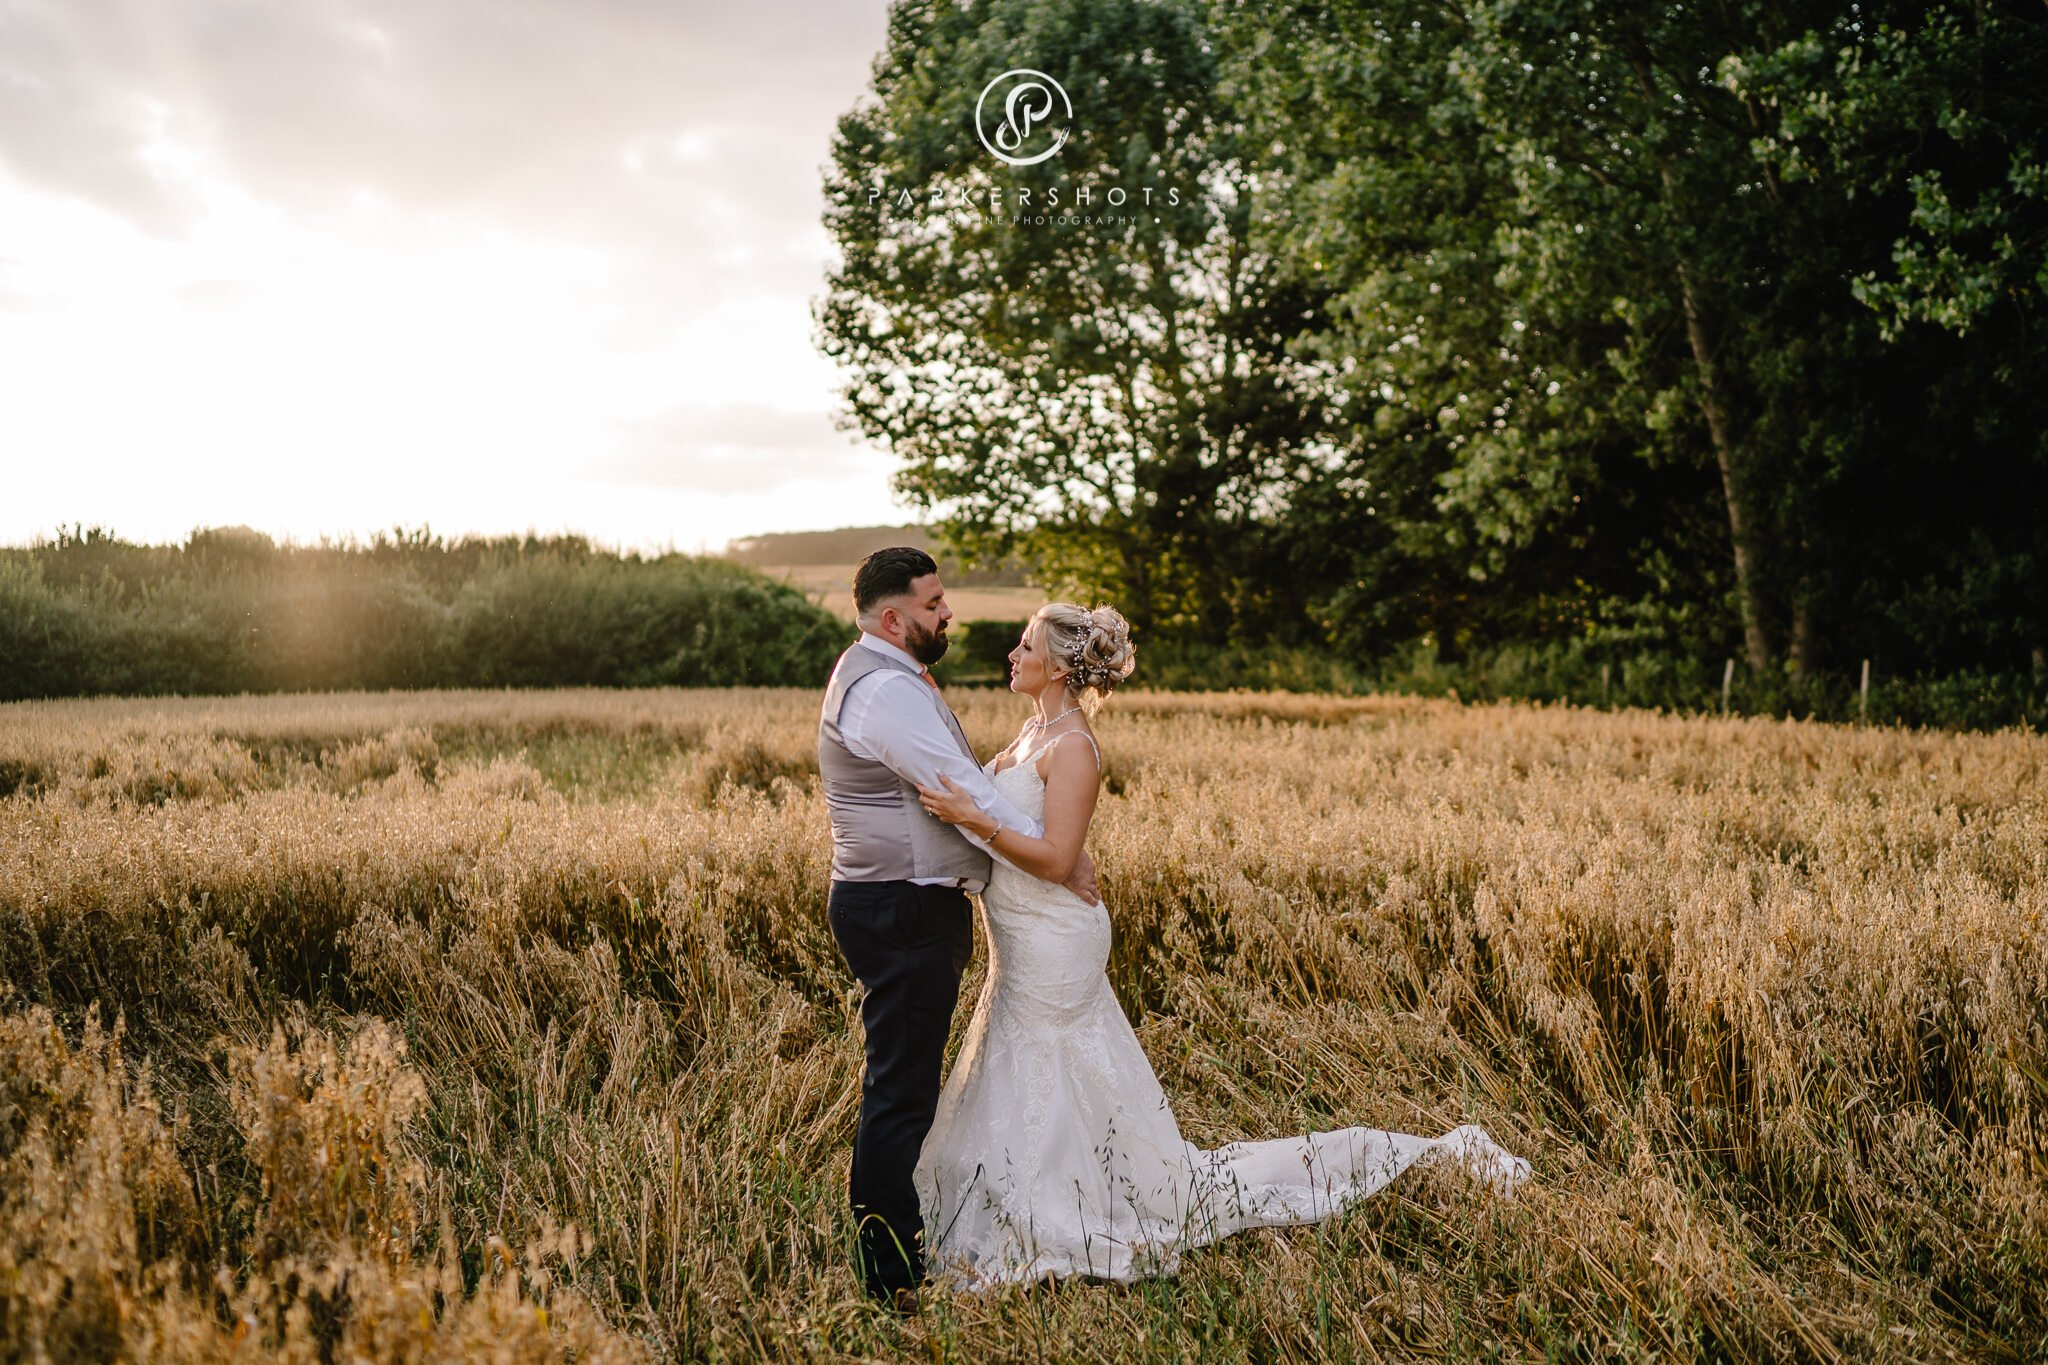 Nettlestead Place wedding photographer - Kathryn & Tim's wedding